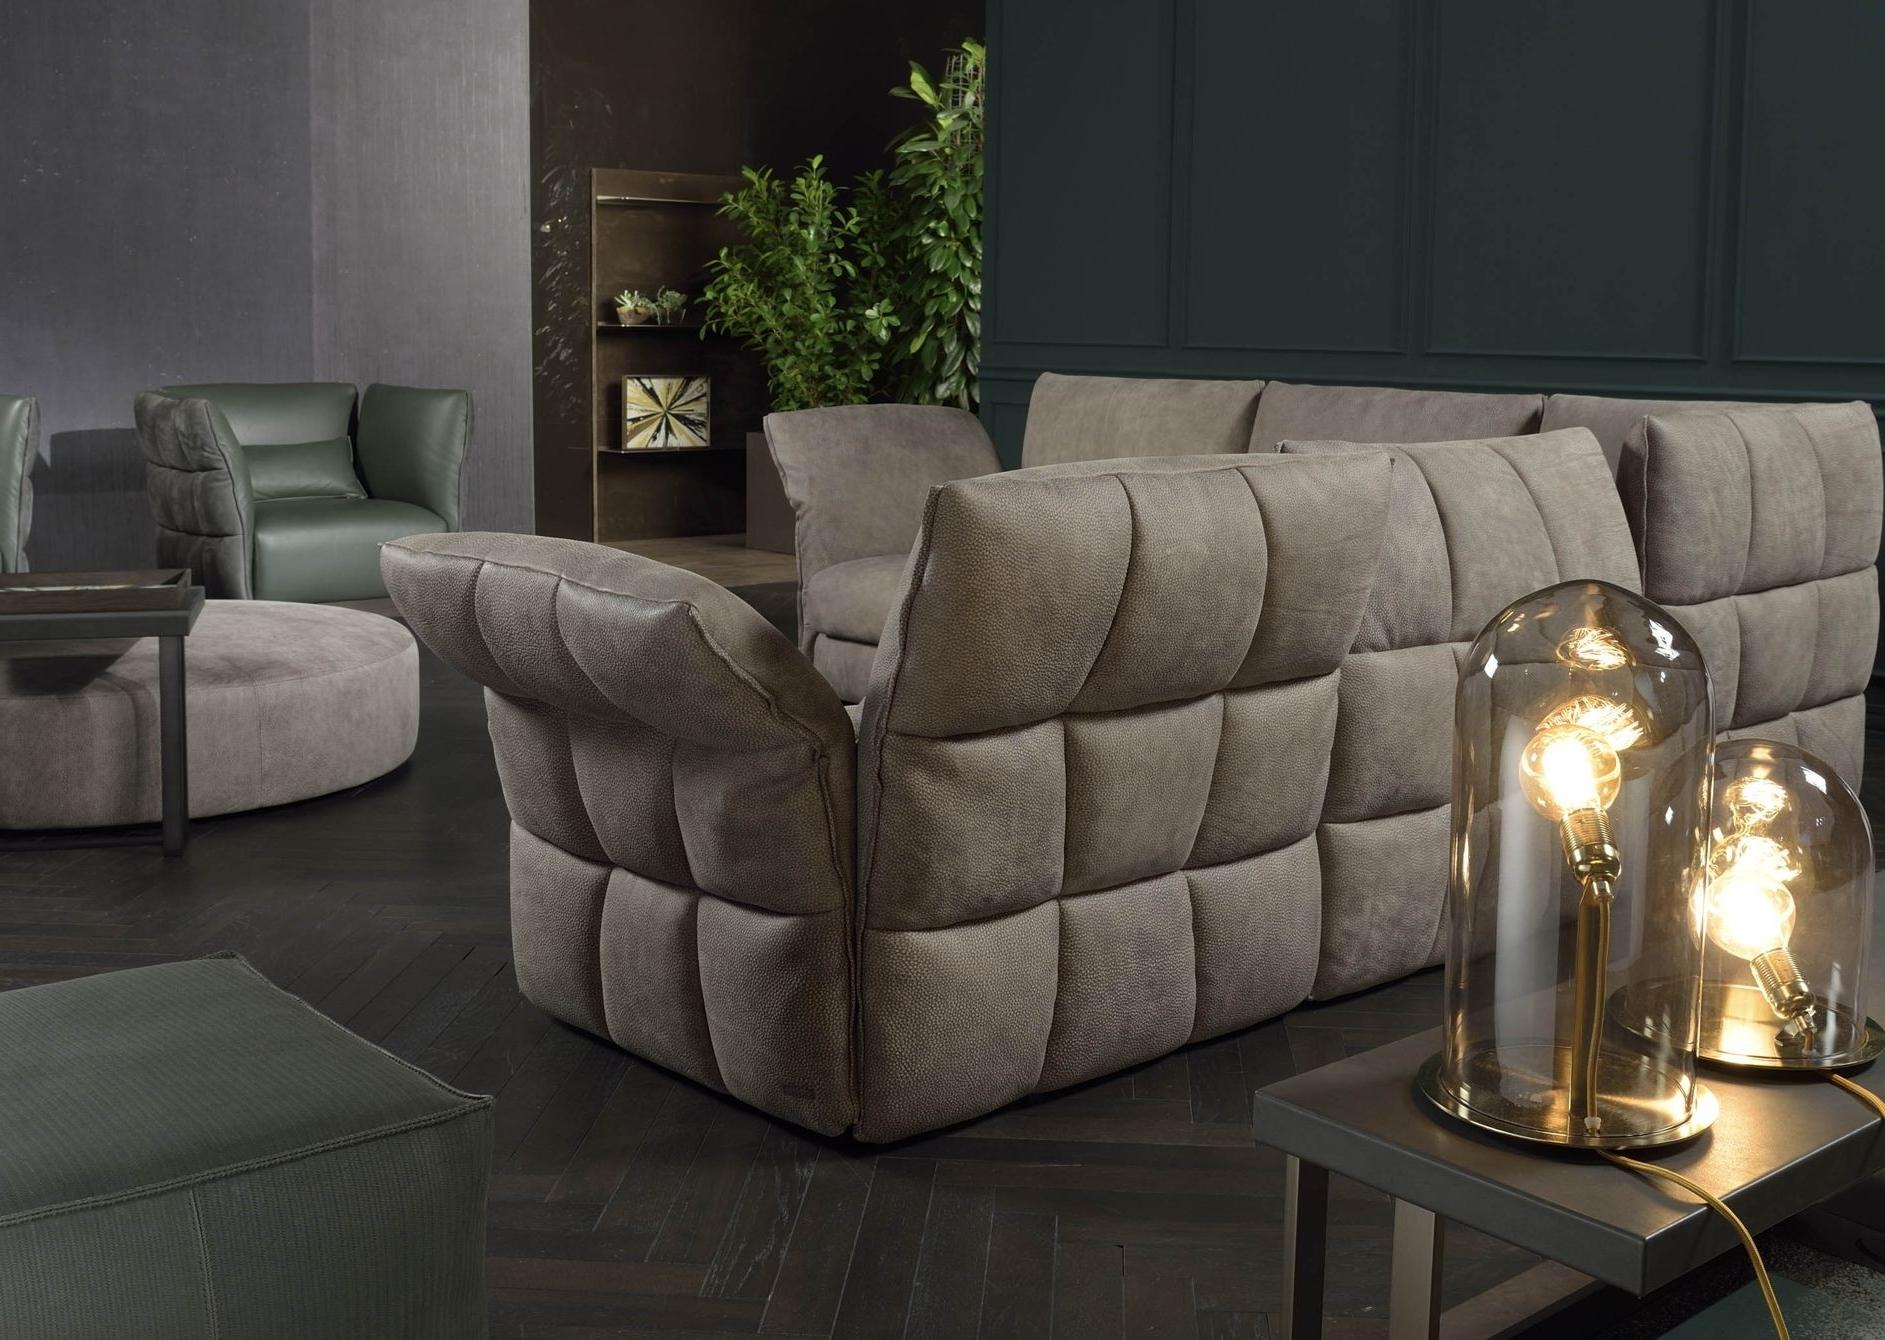 Eva Due Modern Sectional Sofa (View 13 of 20)